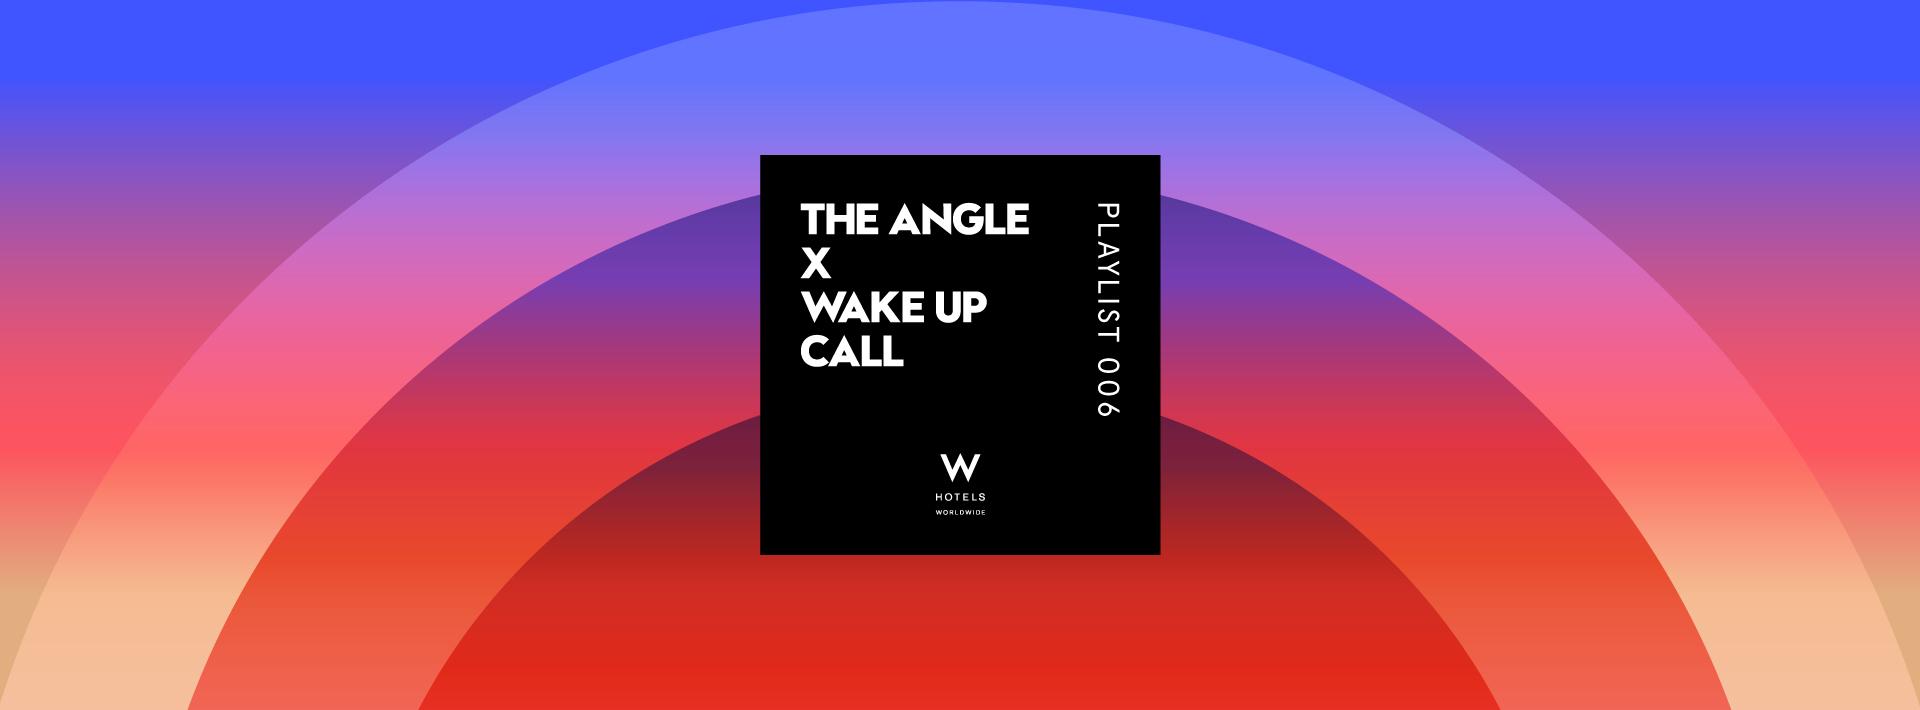 2016_09_06_W-hotels_Wake-Up-Call-Playlist_01